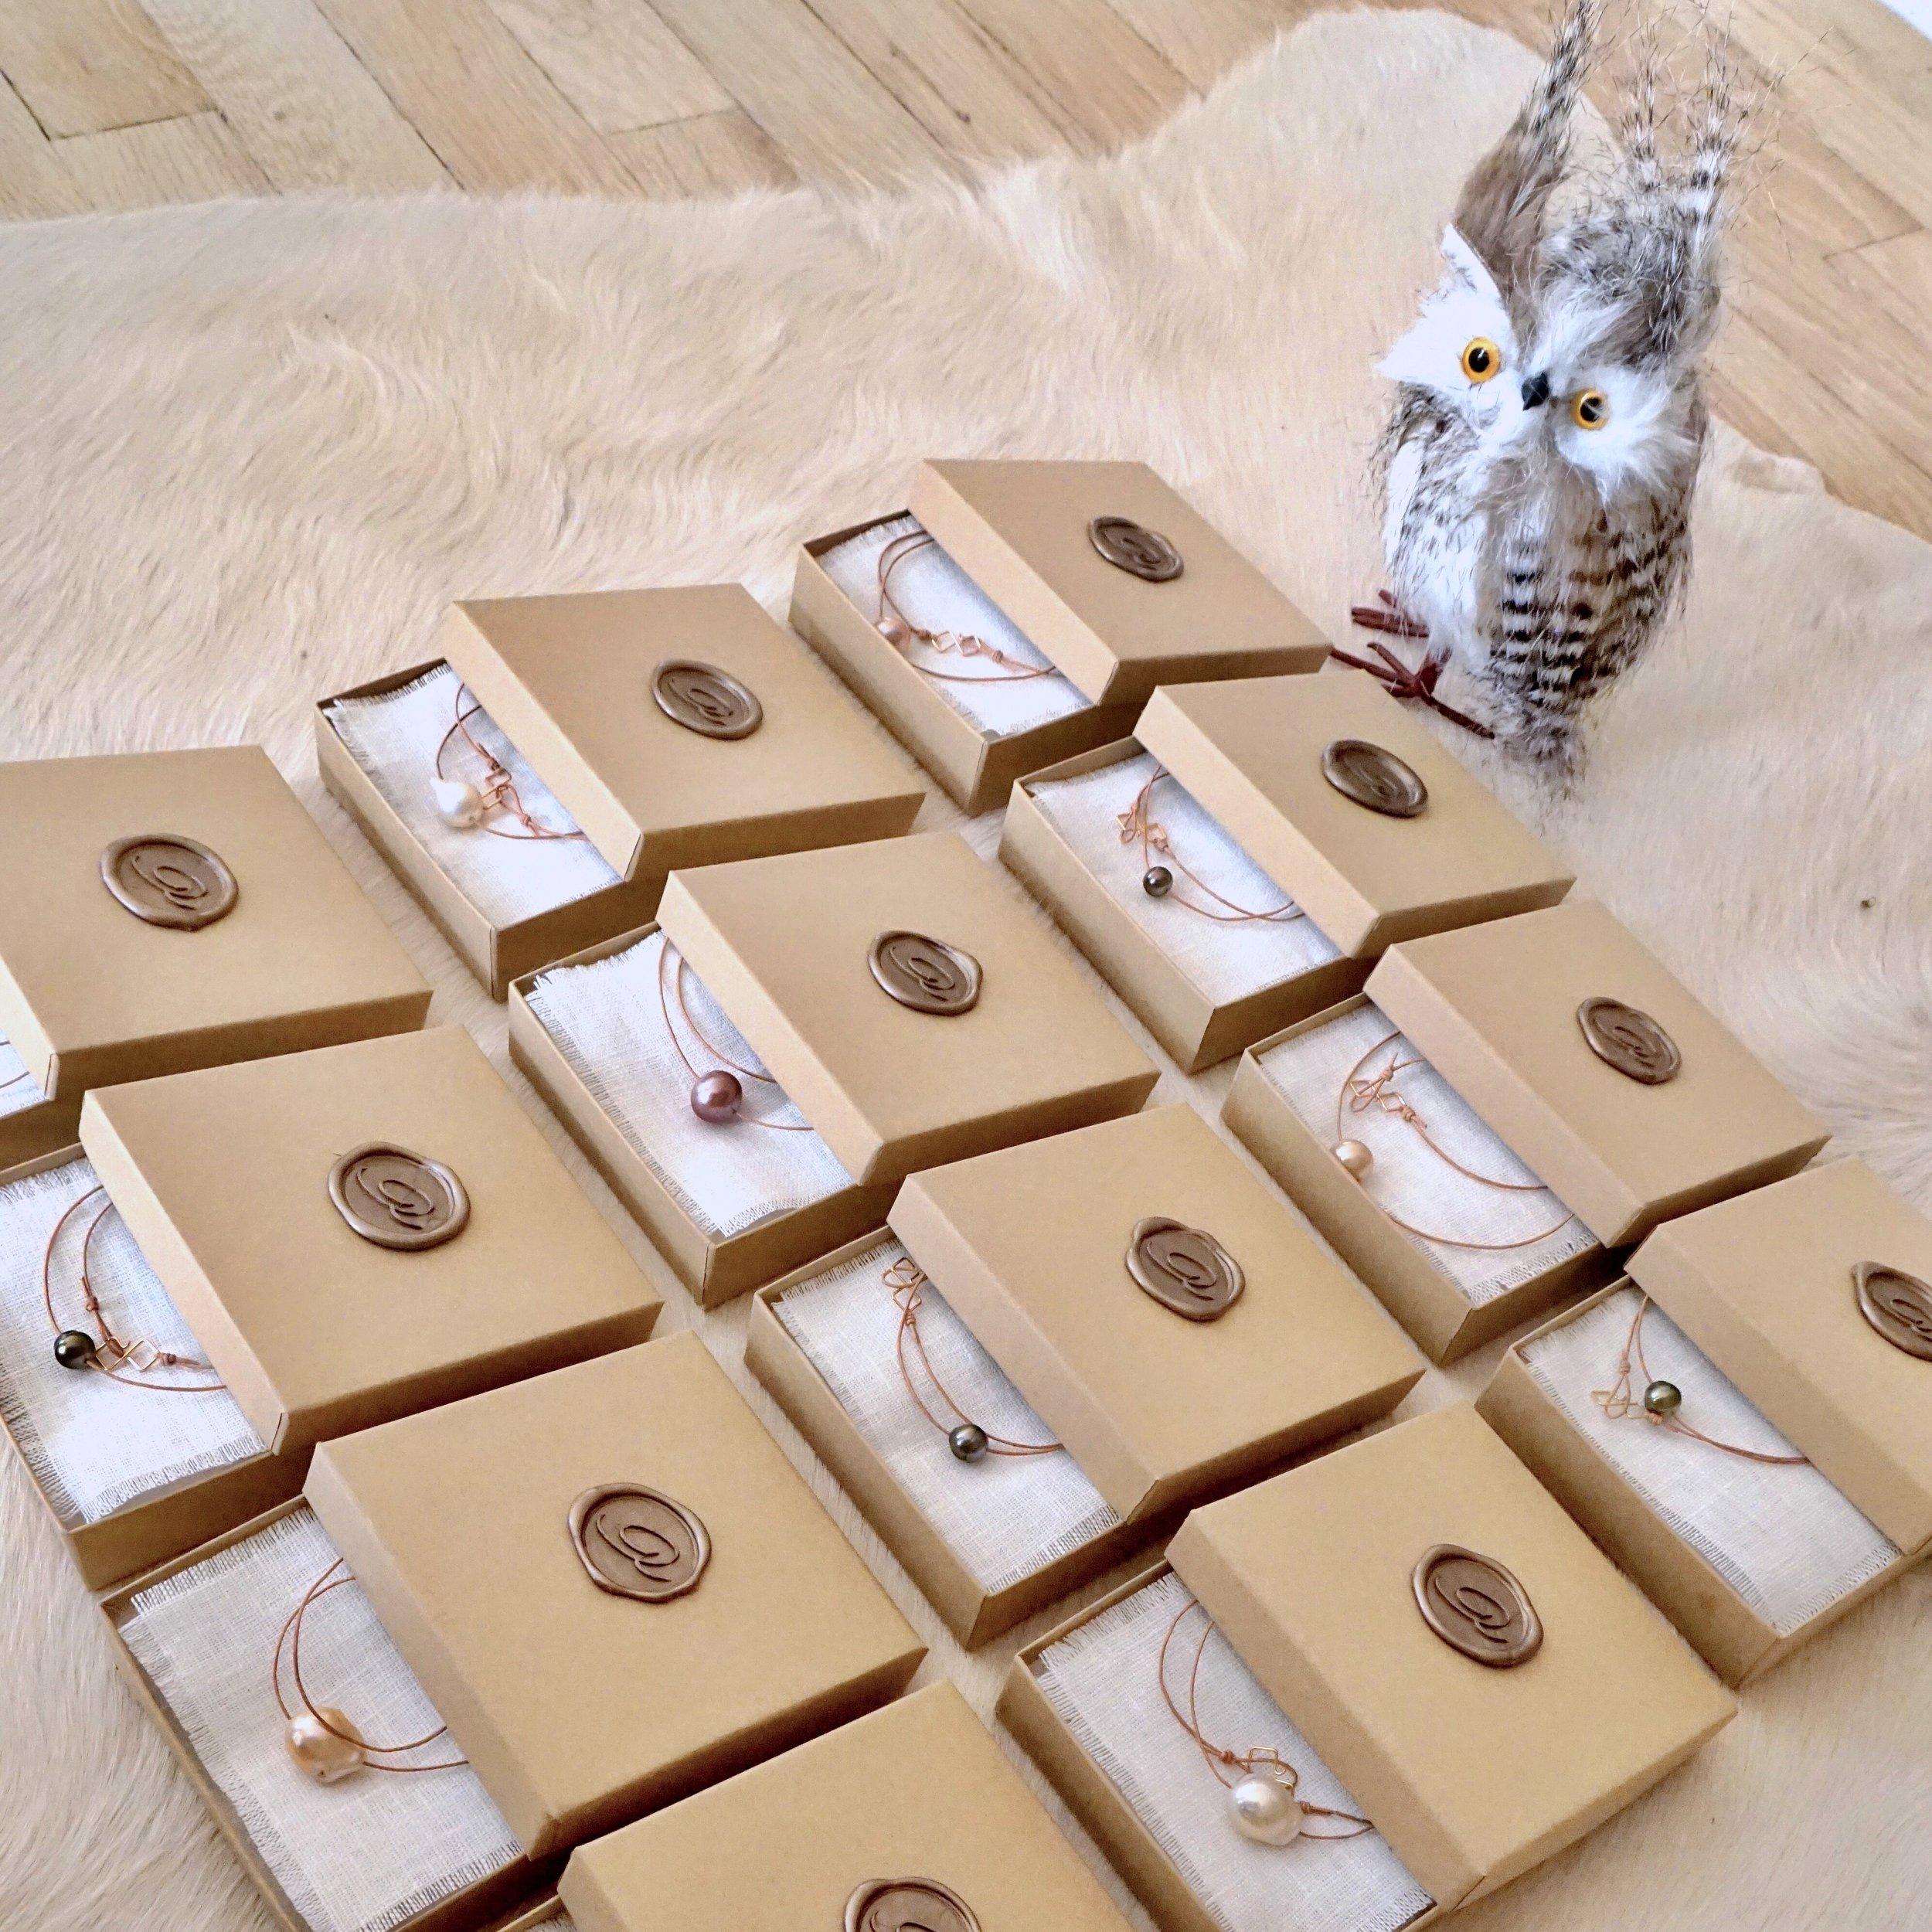 Designs by Alina, Alina de Albergaria, Pearls, Gifts, Santa Barbara